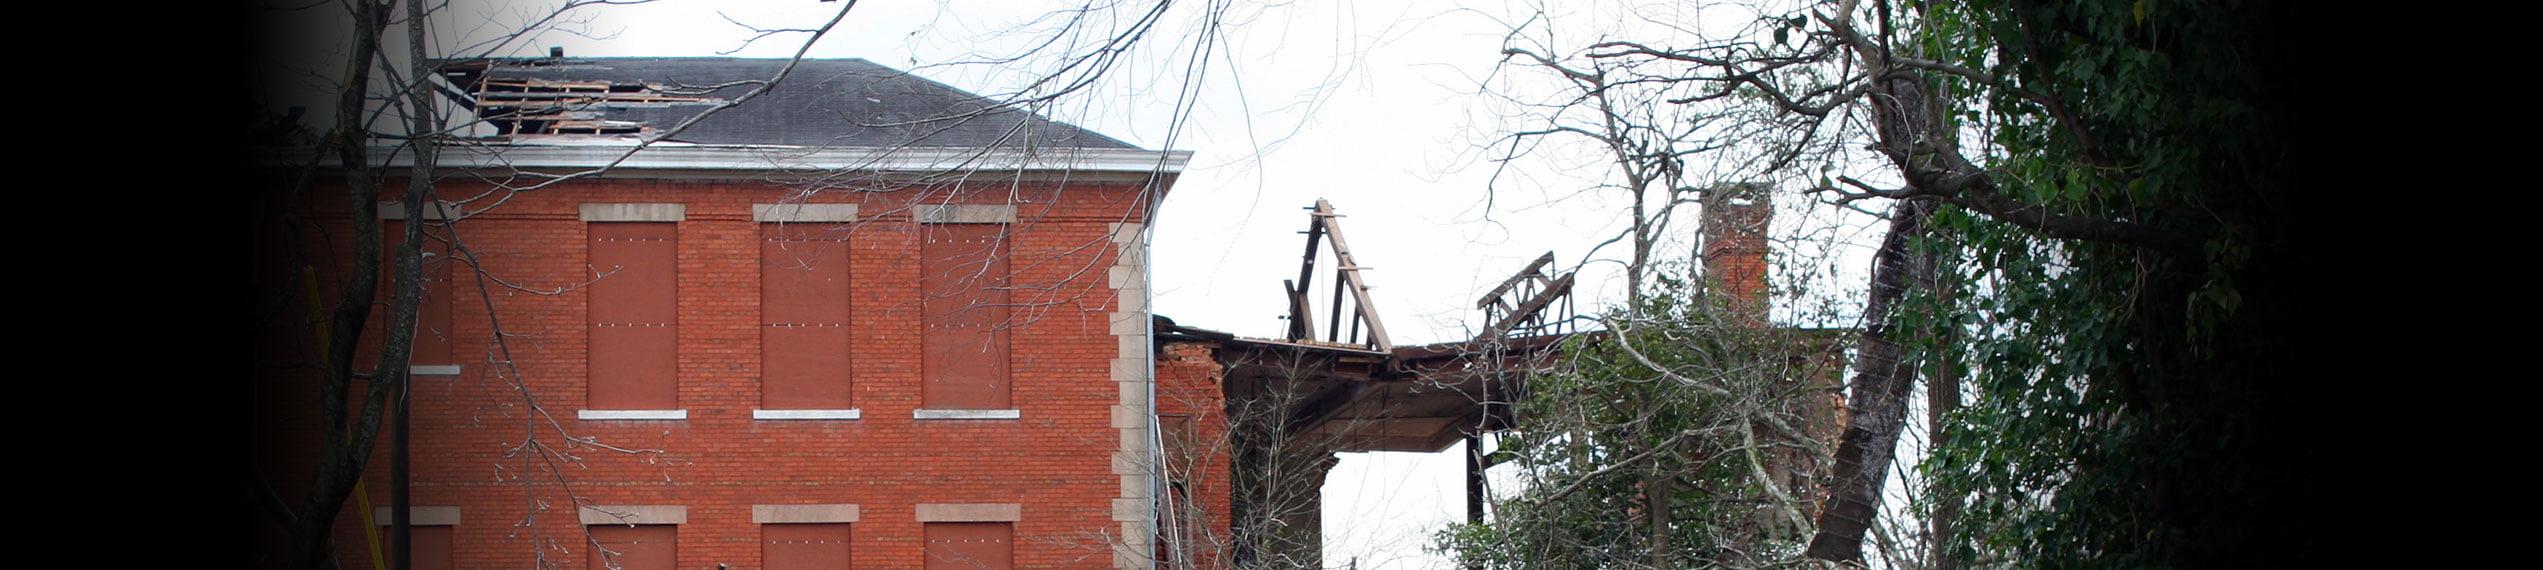 Wind & Storm Damage Repairs in Paul Davis Restoration & Remodeling of Mid Michigan